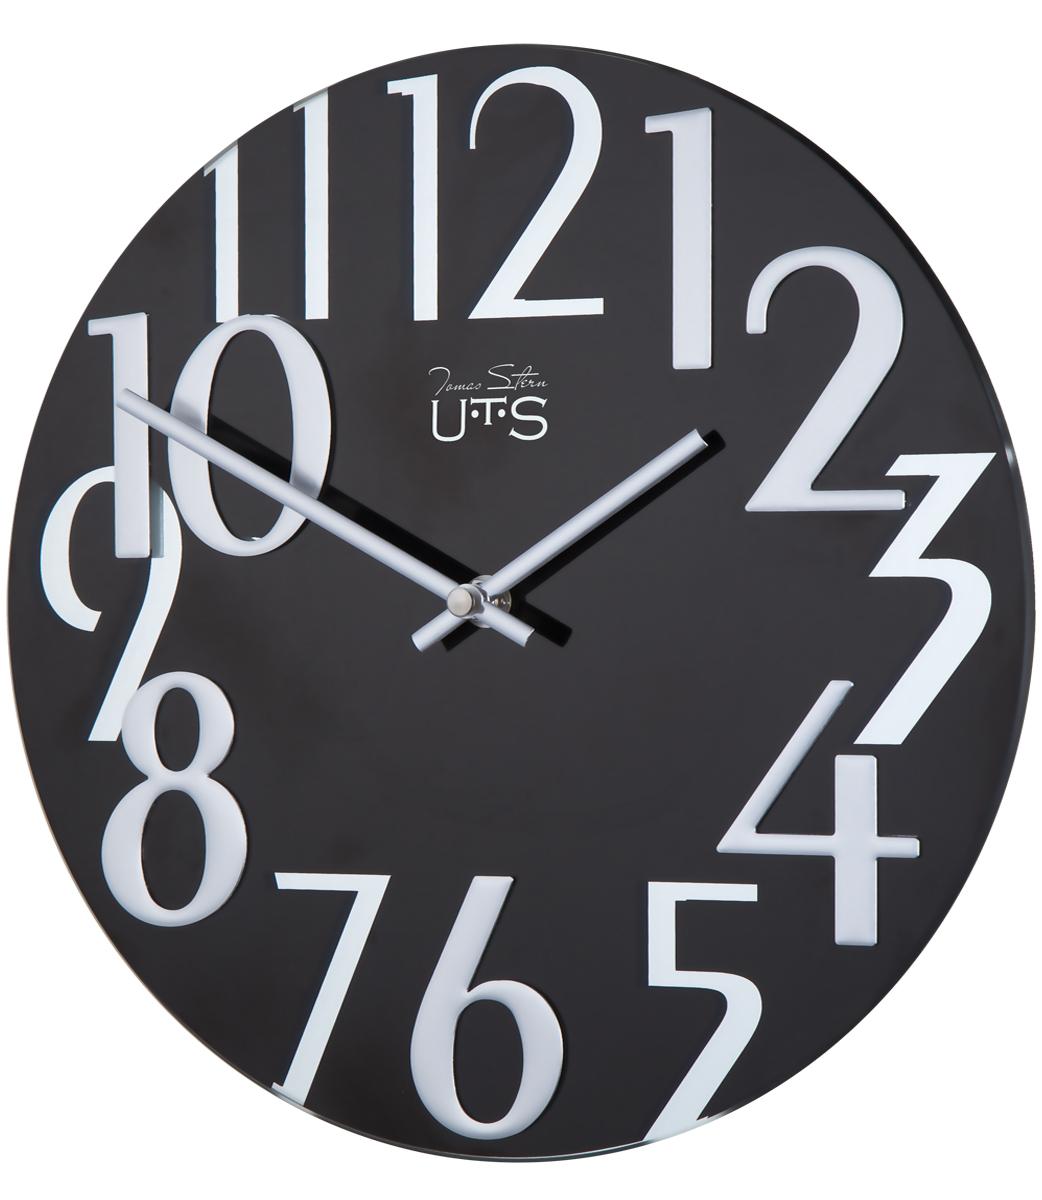 Часы настенные Часы настенные Tomas Stern 8015 chasy-nastennye-tomas-stern-8015-germaniya.jpg